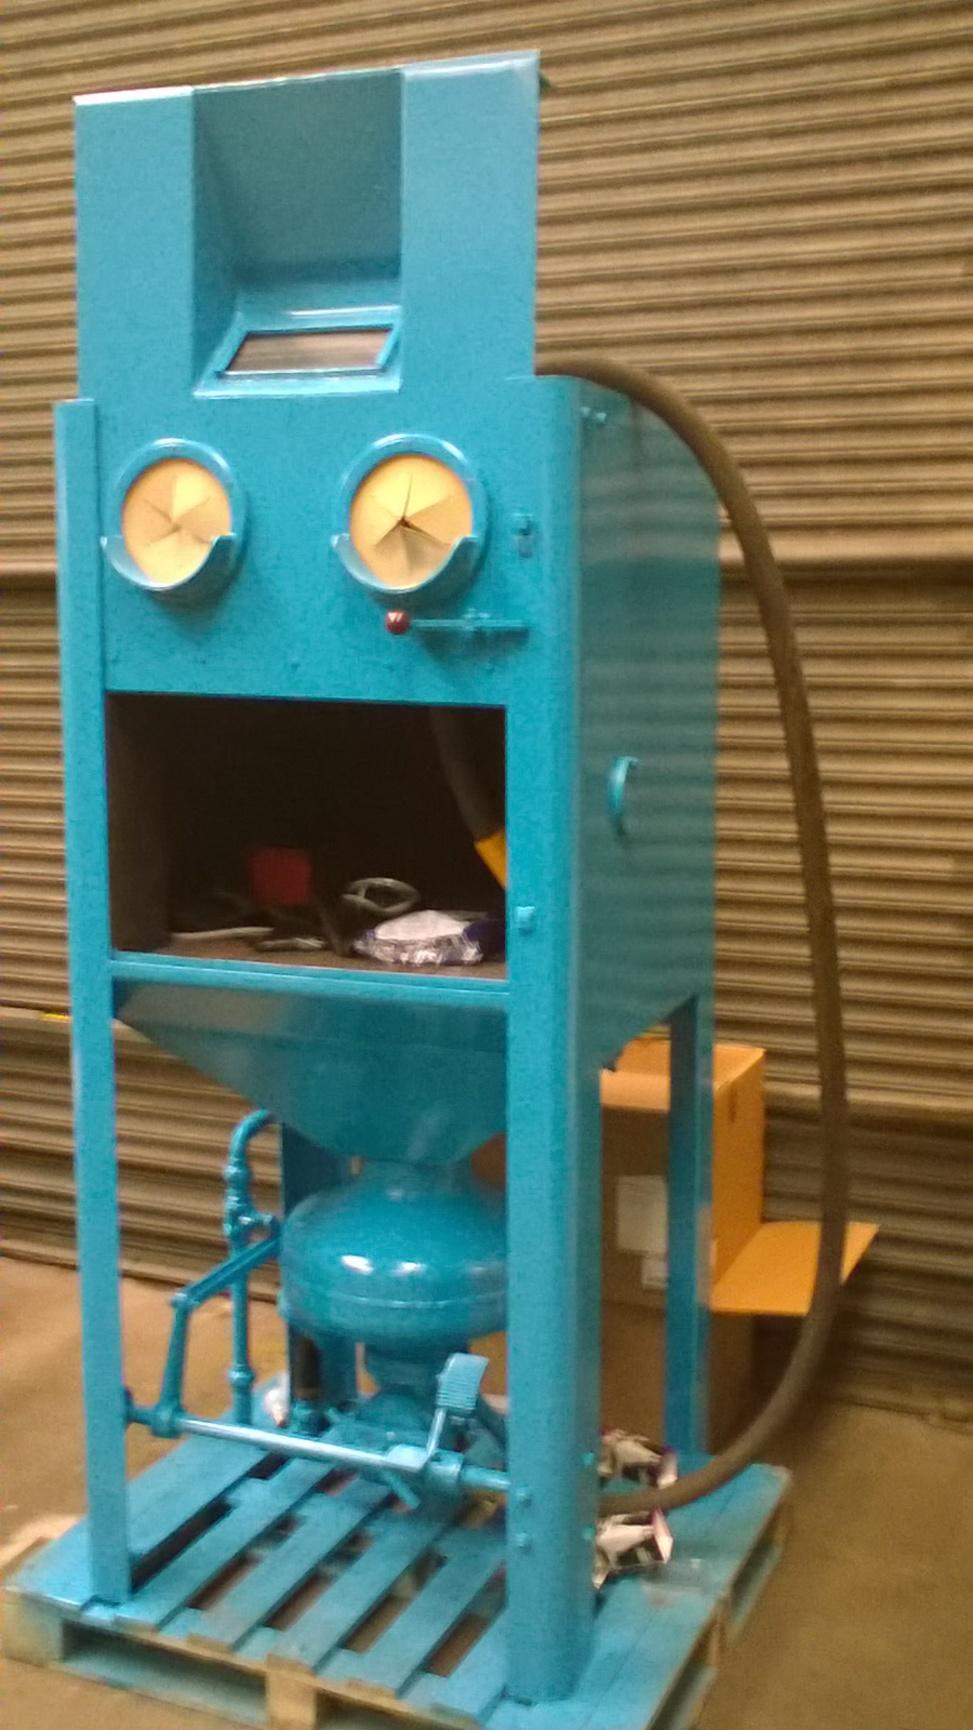 Tilghman Pressure Fed Hand Blast Cabinet